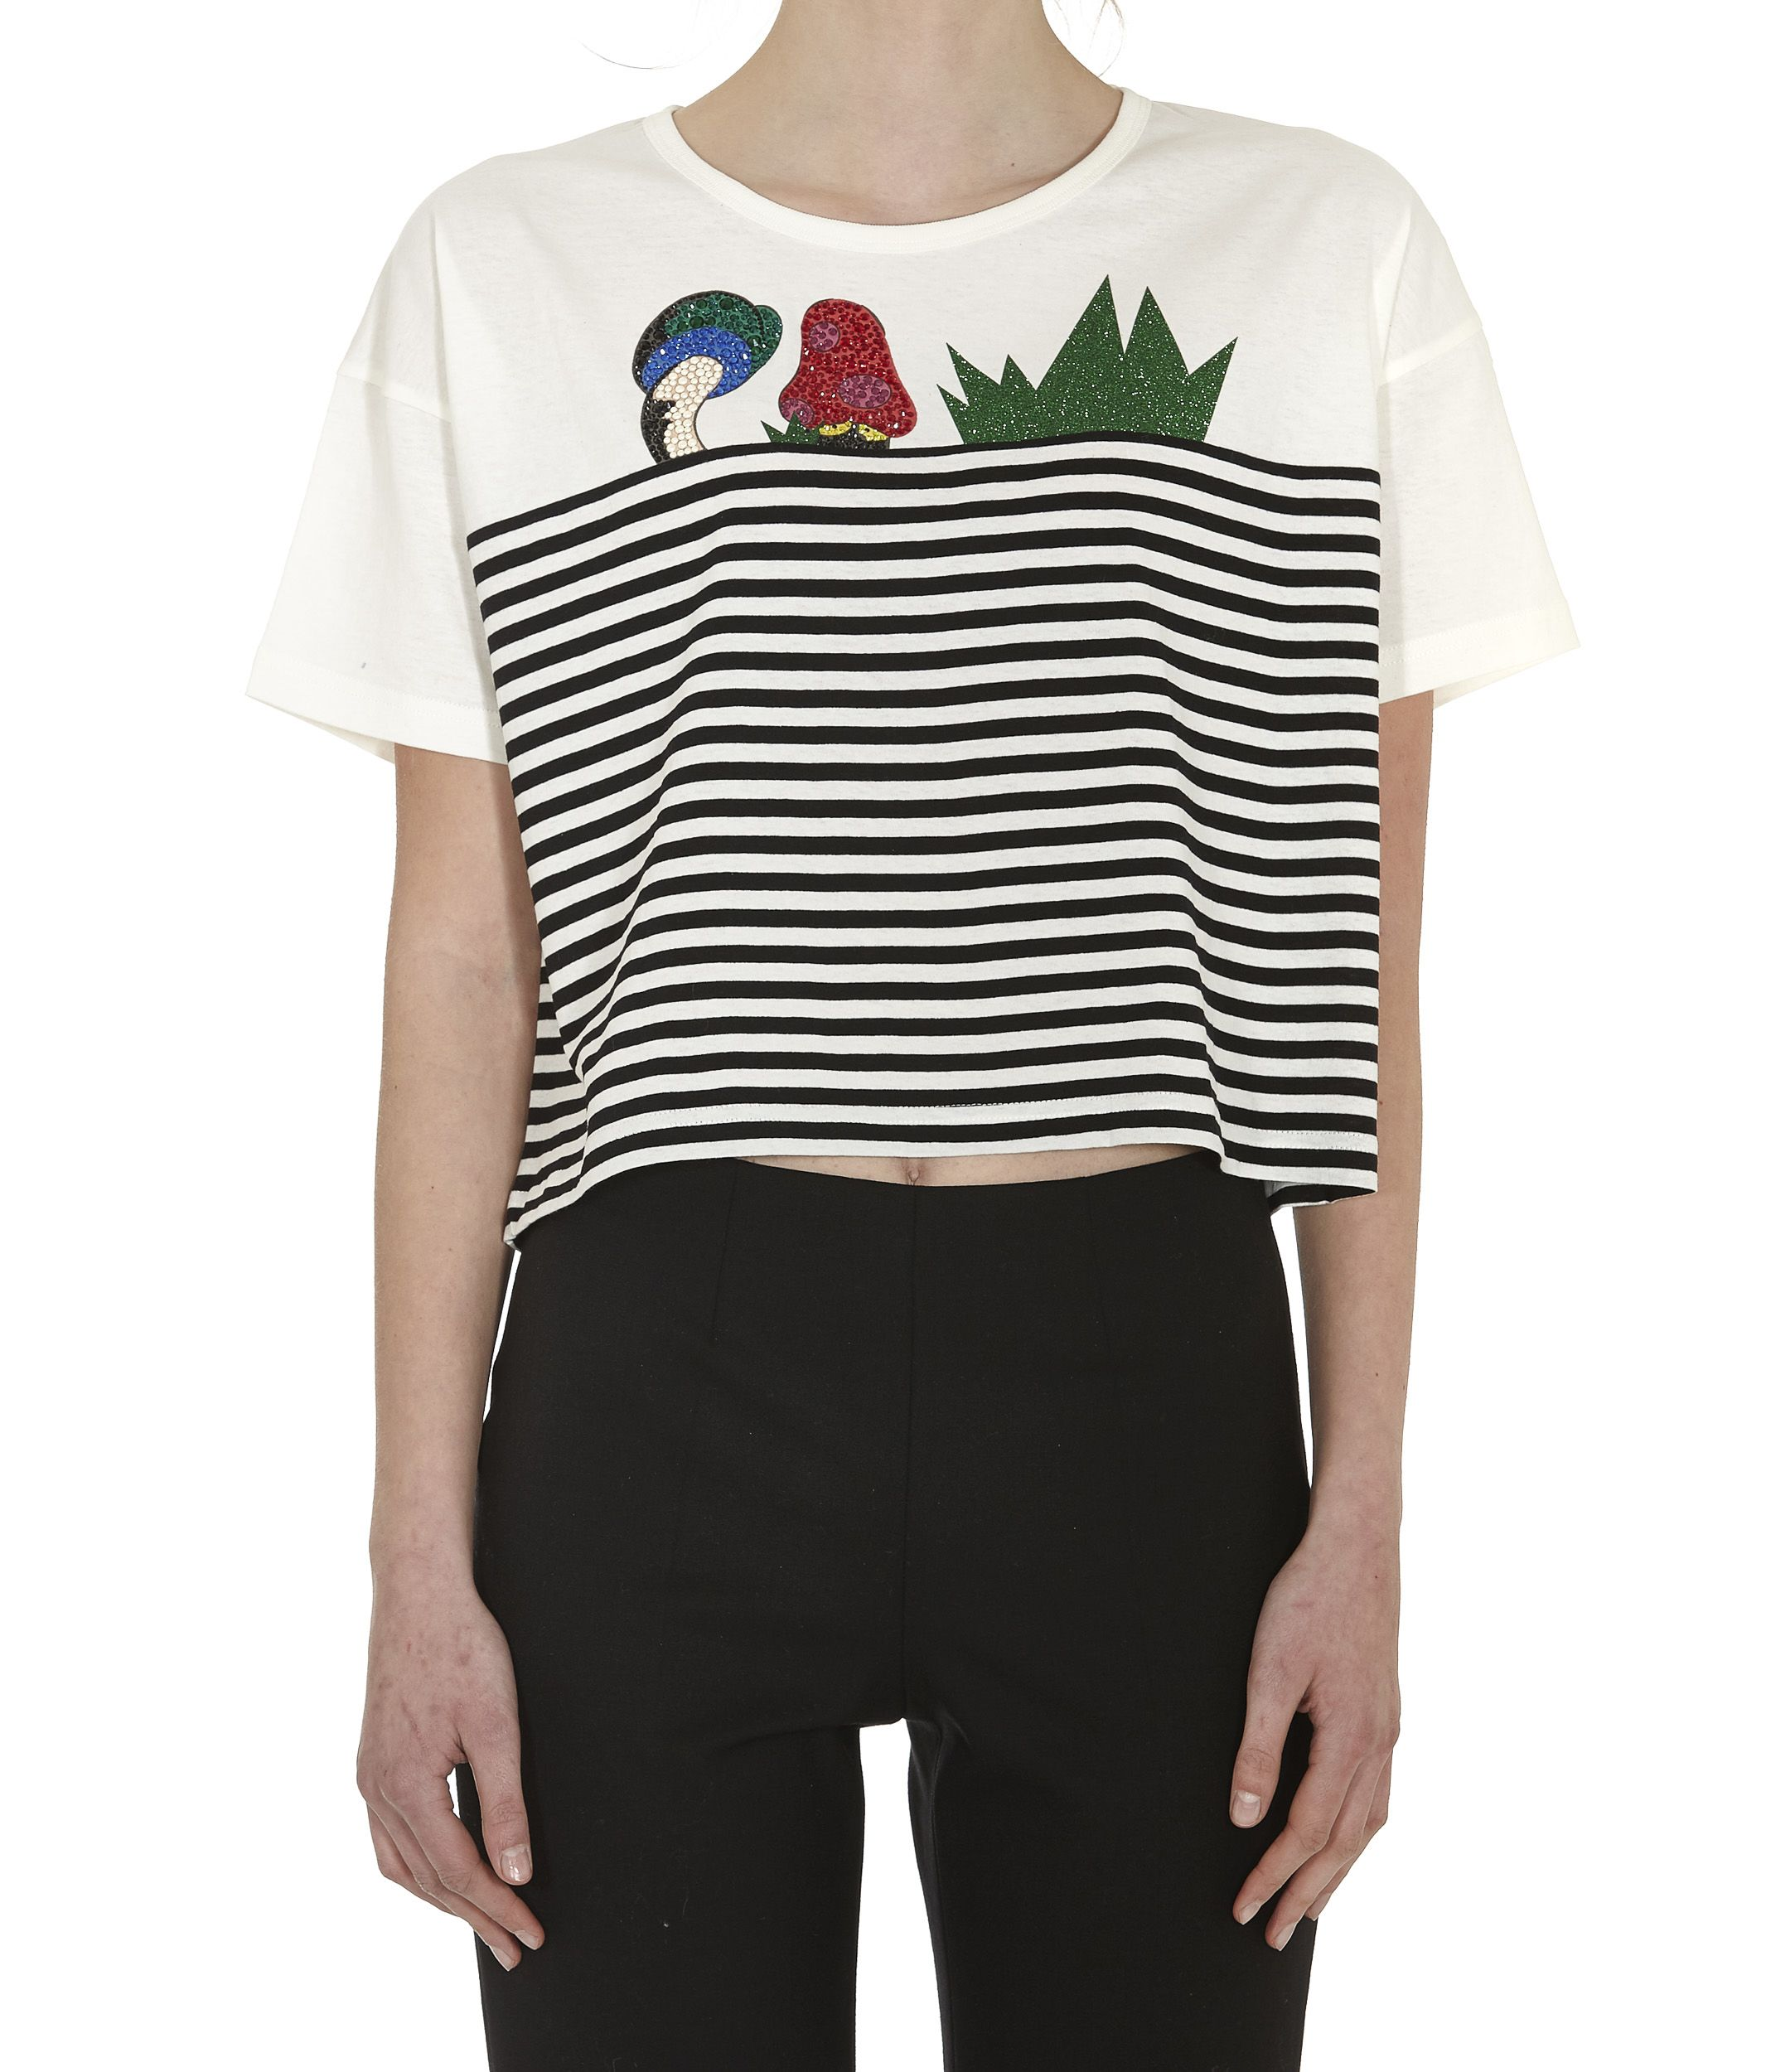 Marc Jacobs Cropped Tshirt